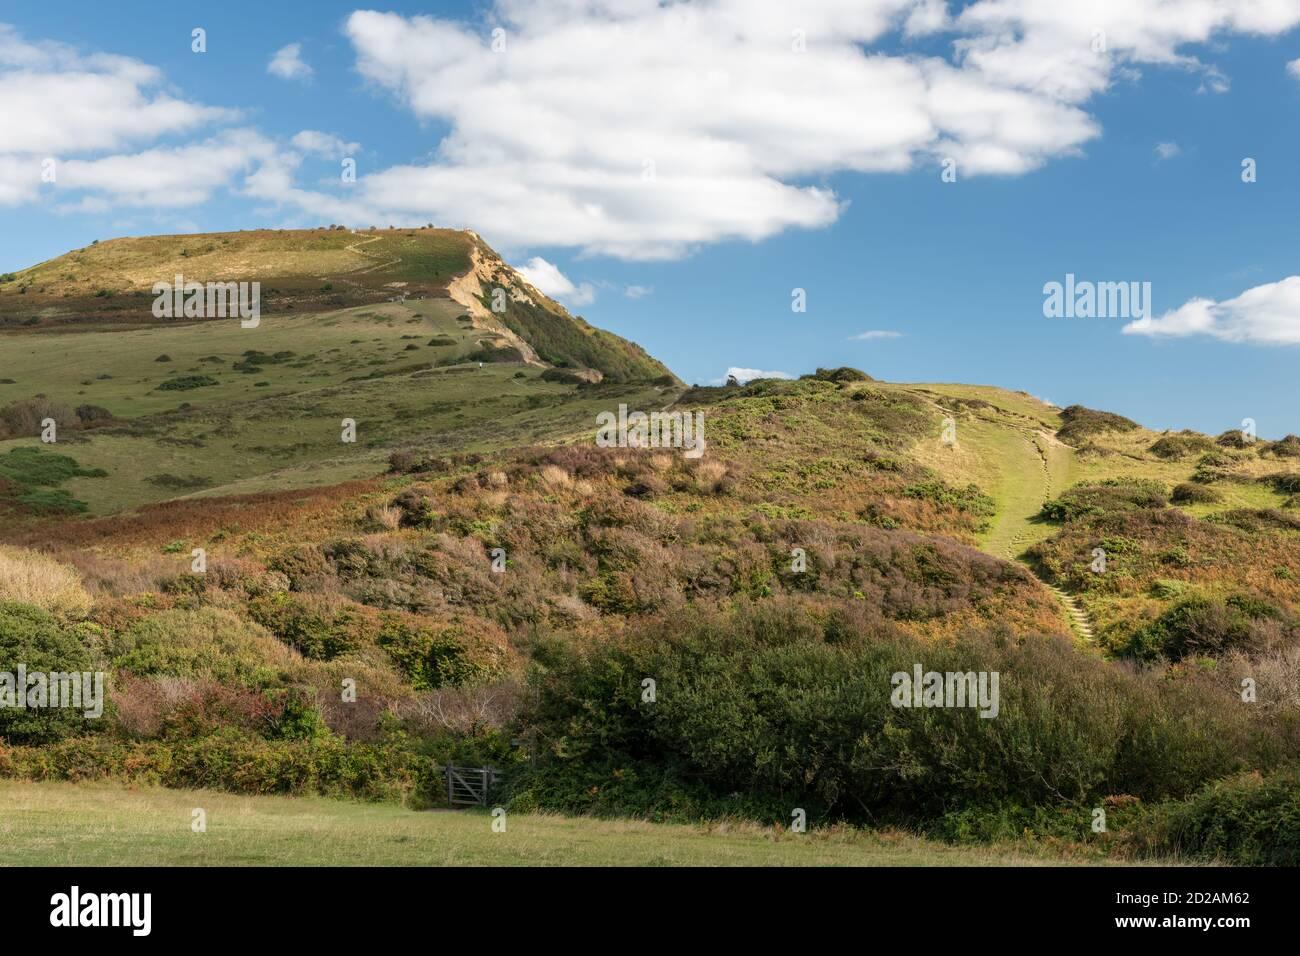 Foto del paisaje de la montaña Golden Cap en la costa Jurásica En Dorset Foto de stock